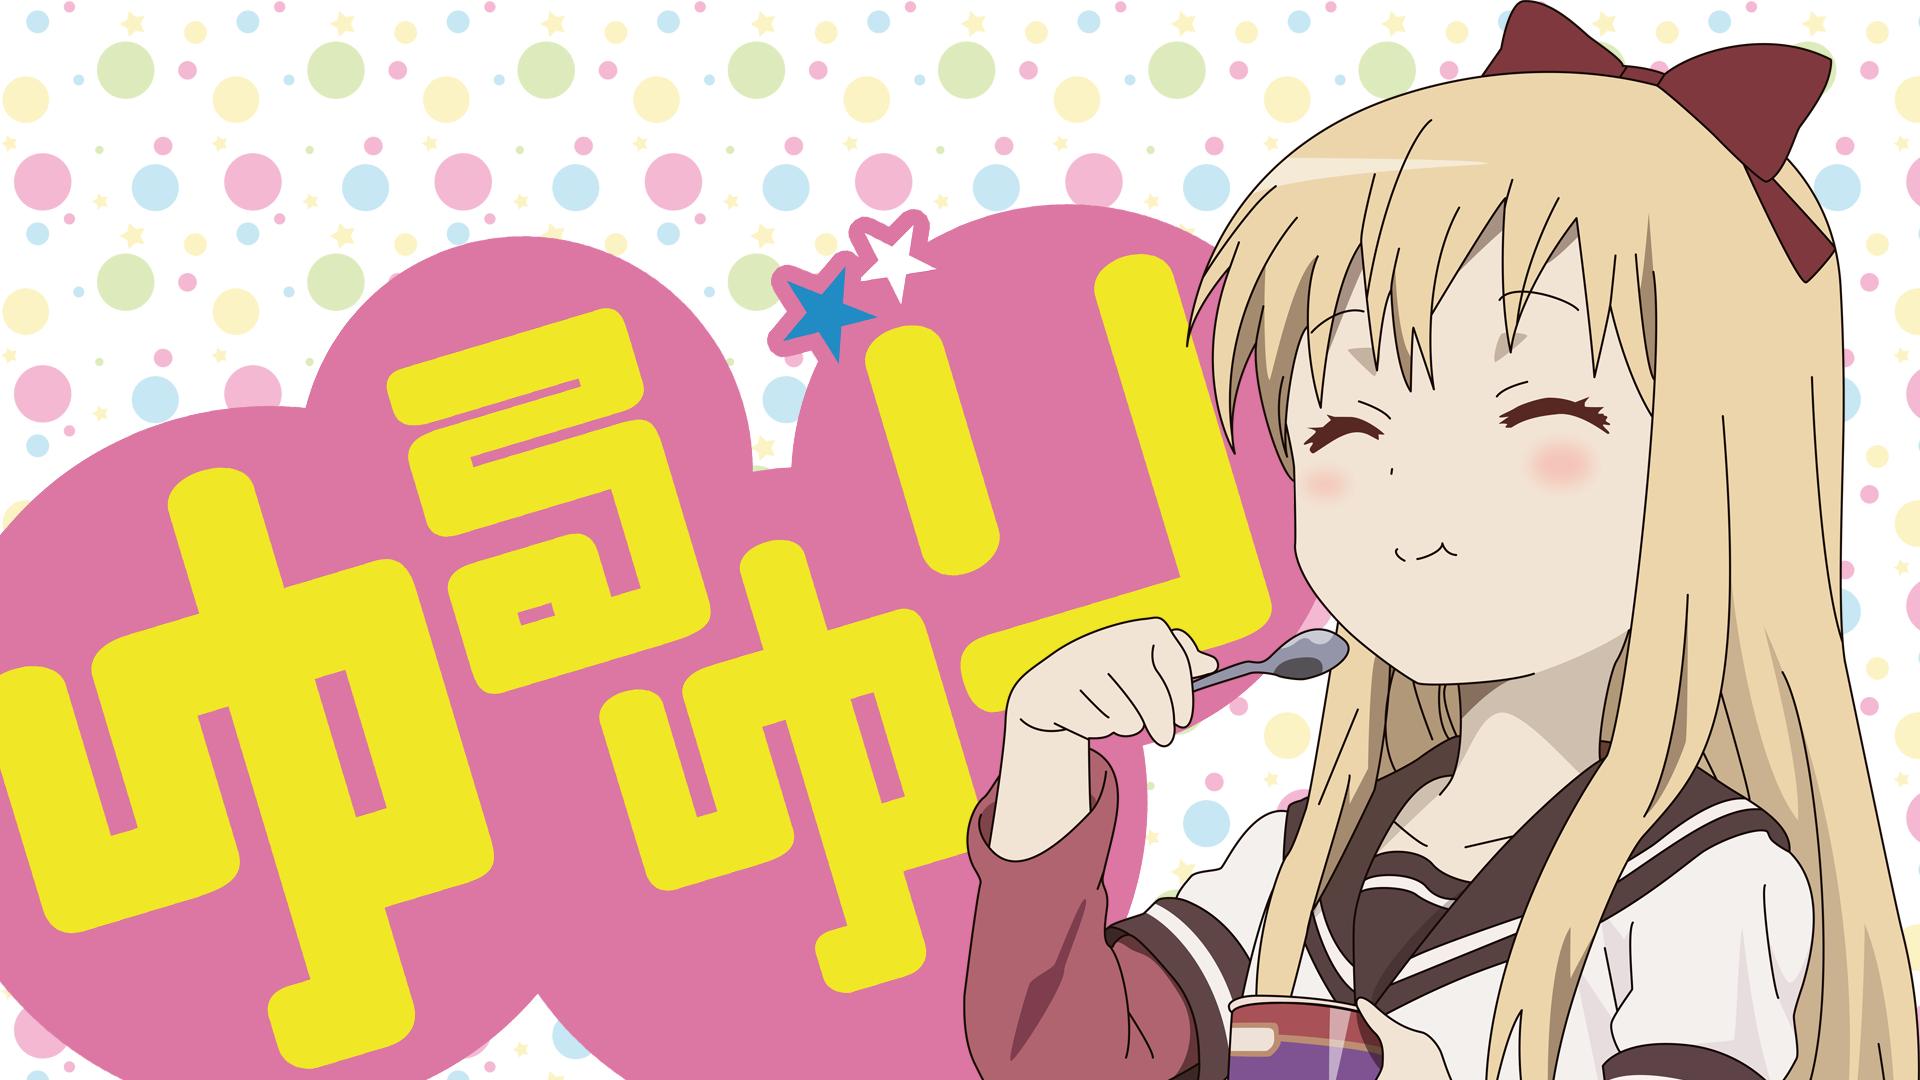 Anime 1920x1080 anime Yuru Yuri Toshinou Kyouko anime girls food blonde spoon closed eyes